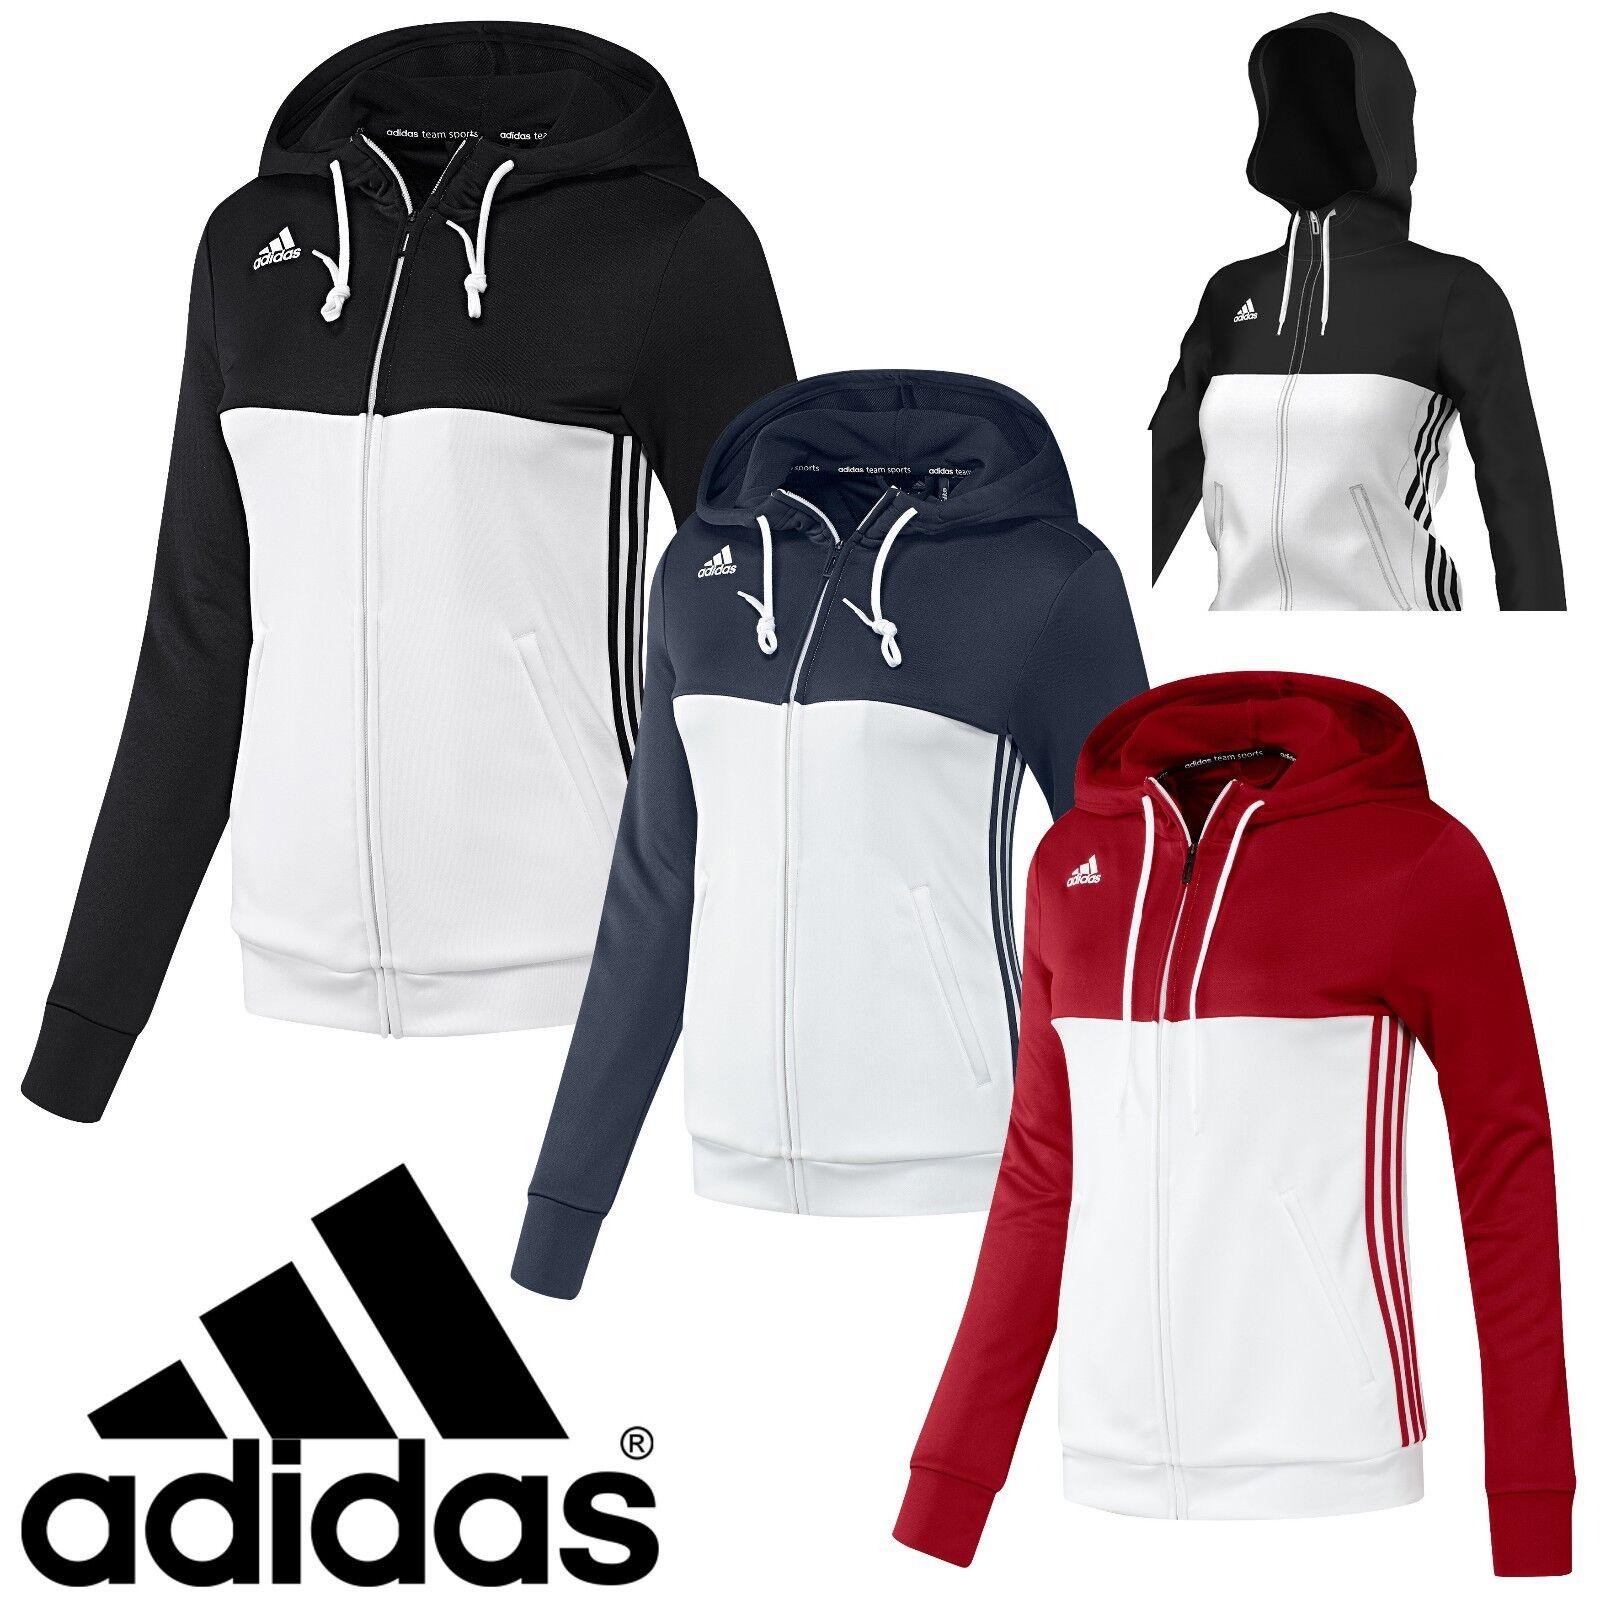 adidas Ladies T16 Climalite Hoodies ΓυναικΡία αθλητικά πλΞ�ρη φΡρμουάρ σακάκι ΞΌΞ΅ φΡρμουάρ